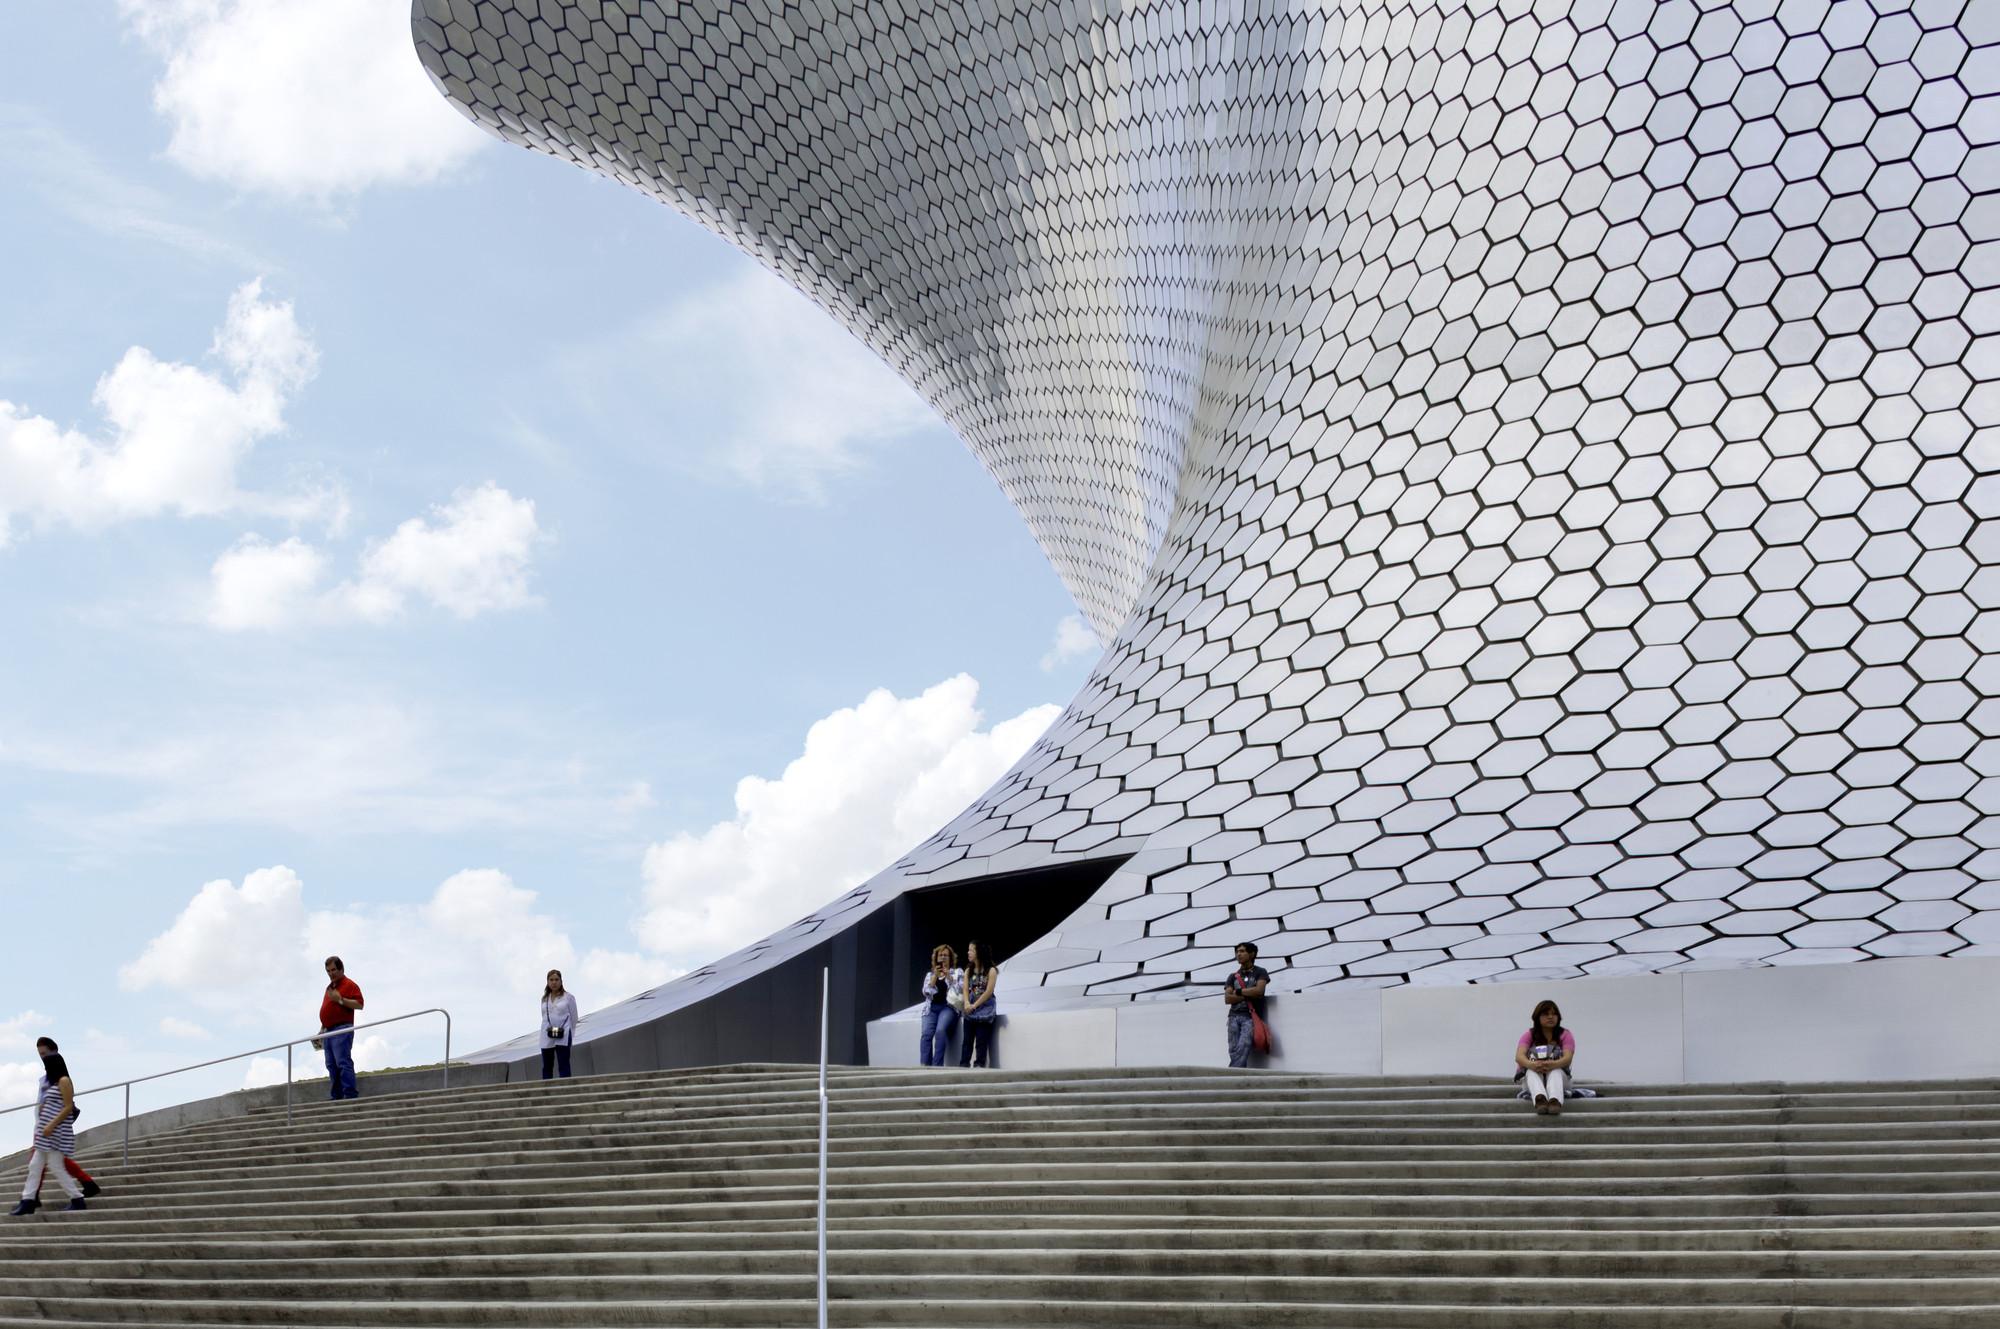 Archivo: Arquitectura Revestida en Patrones Geométricos, © Rafael Gamo